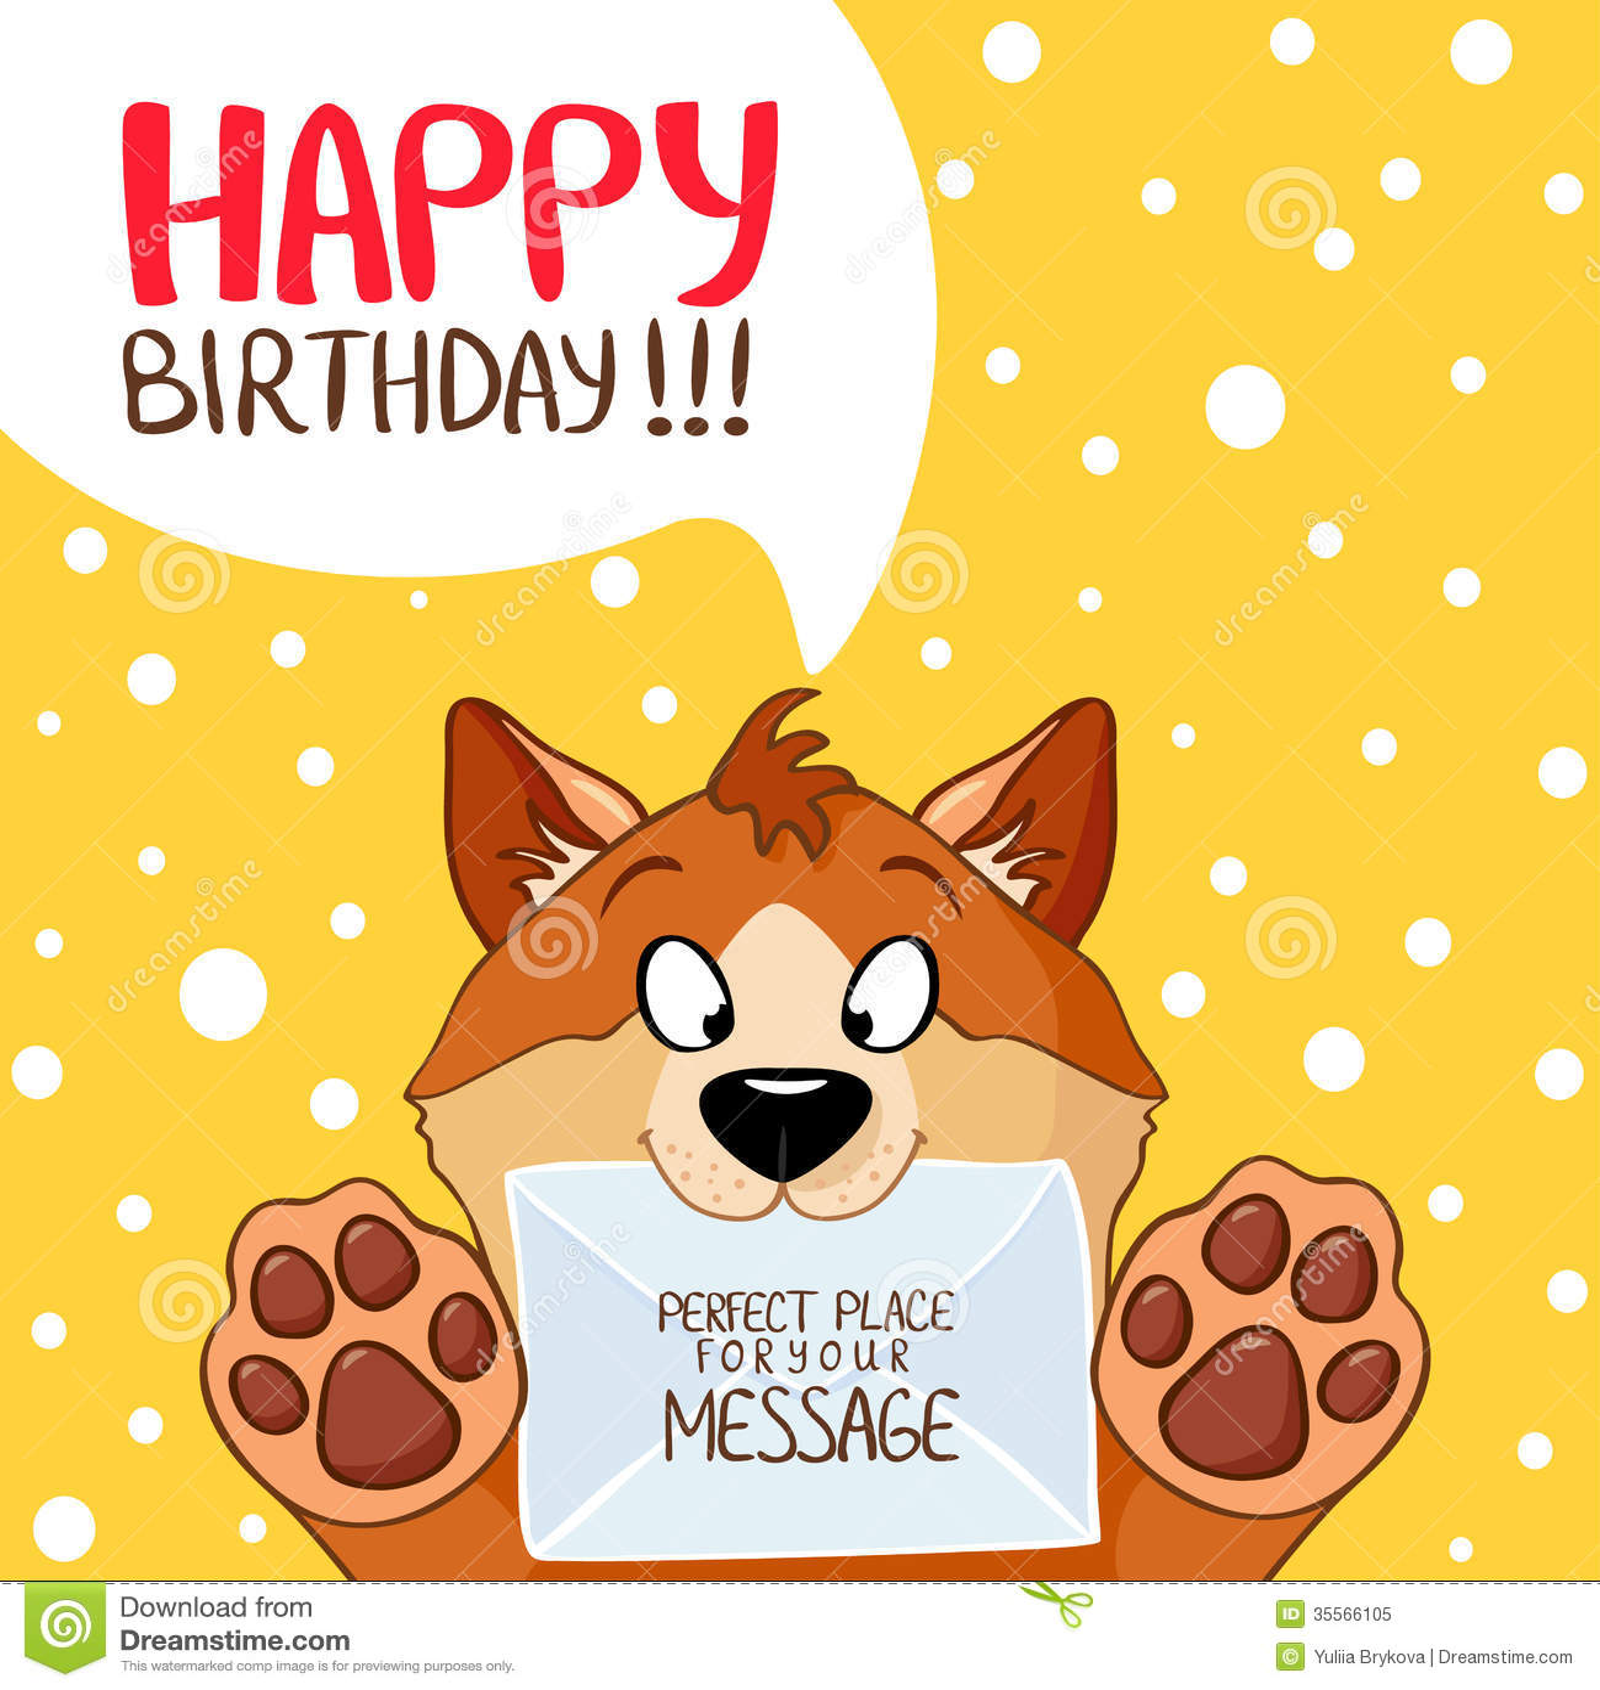 Dog Message Birthday Royalty Free Stock Photo - Image: 35566105